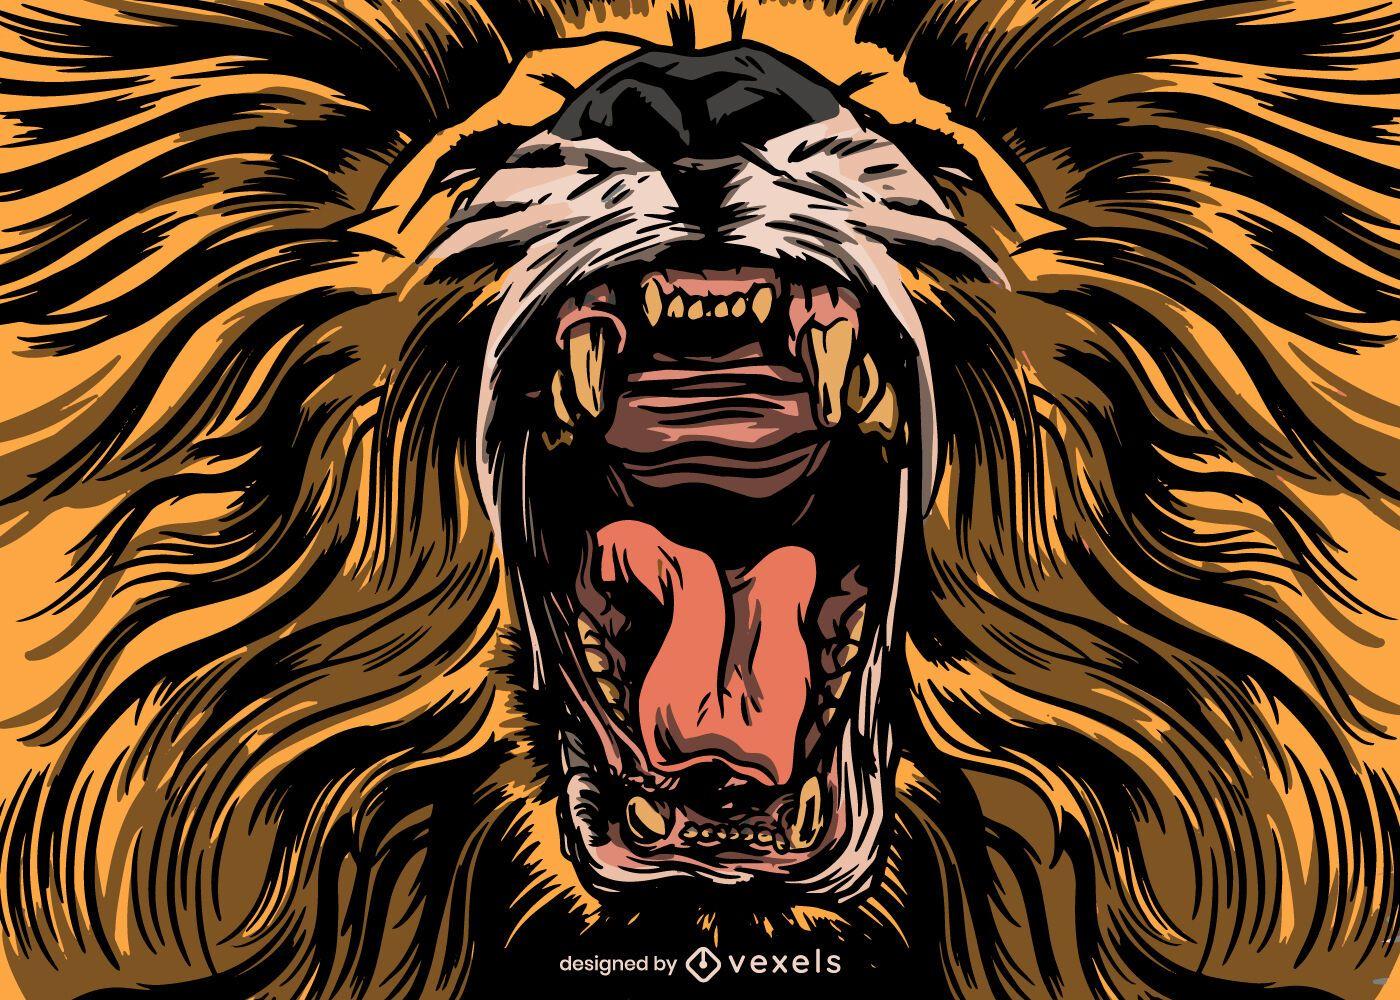 Roaring lion illustration design